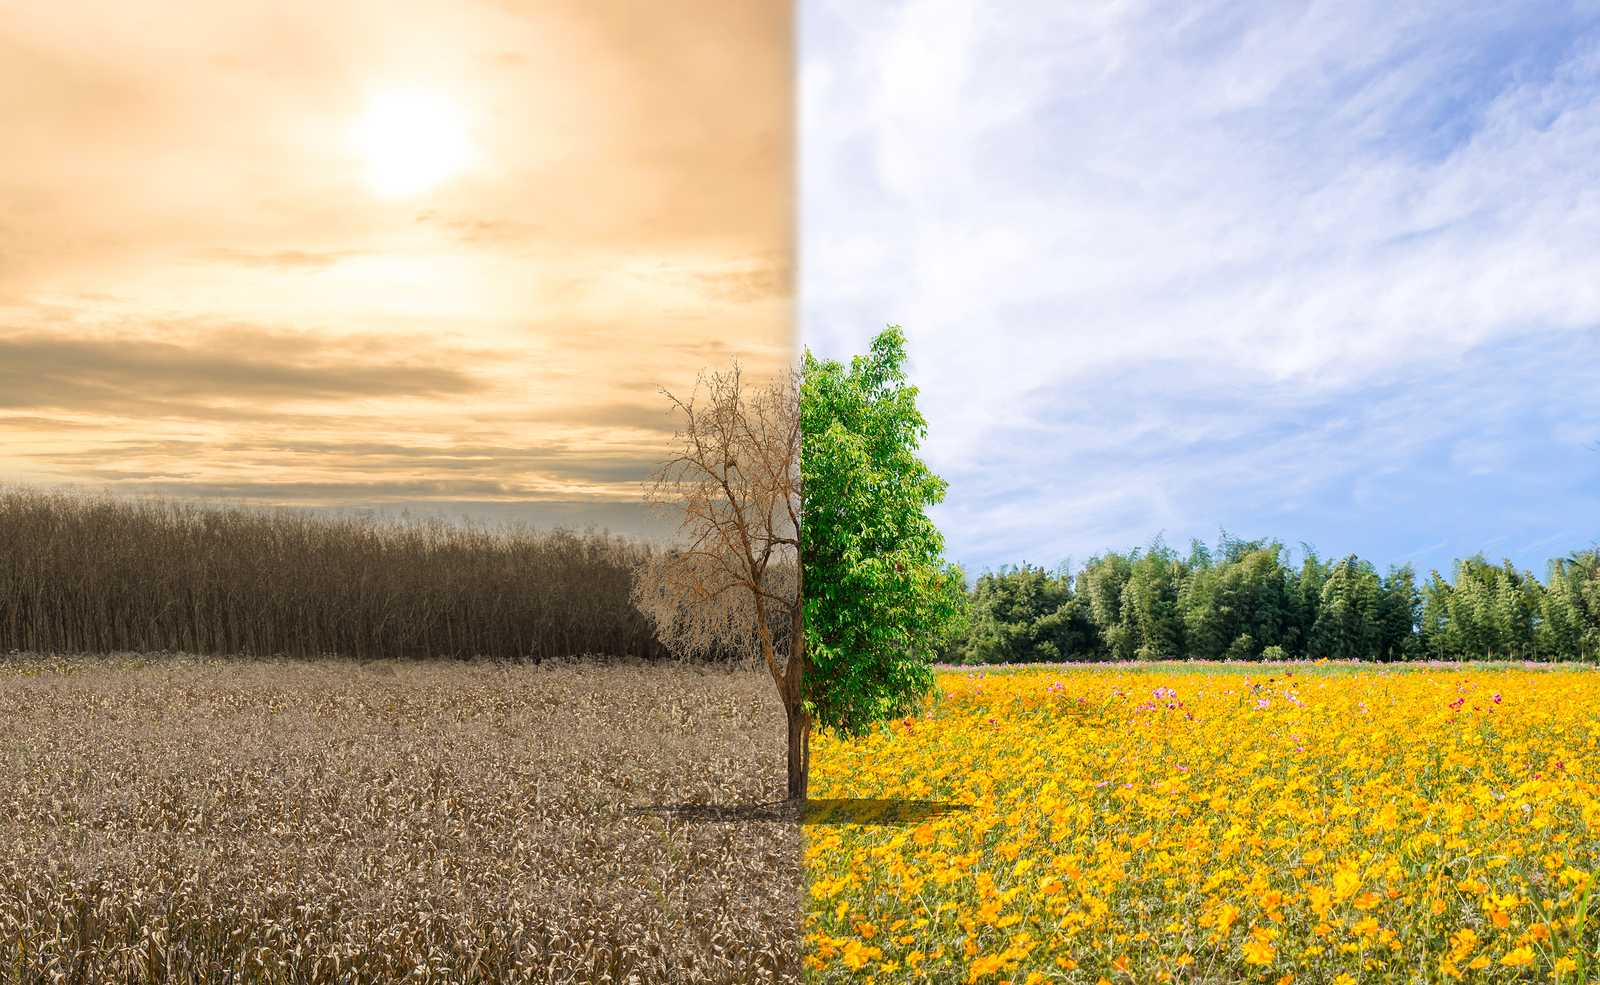 bigstock-Environment-Change-And-Ecology-259300567.jpg